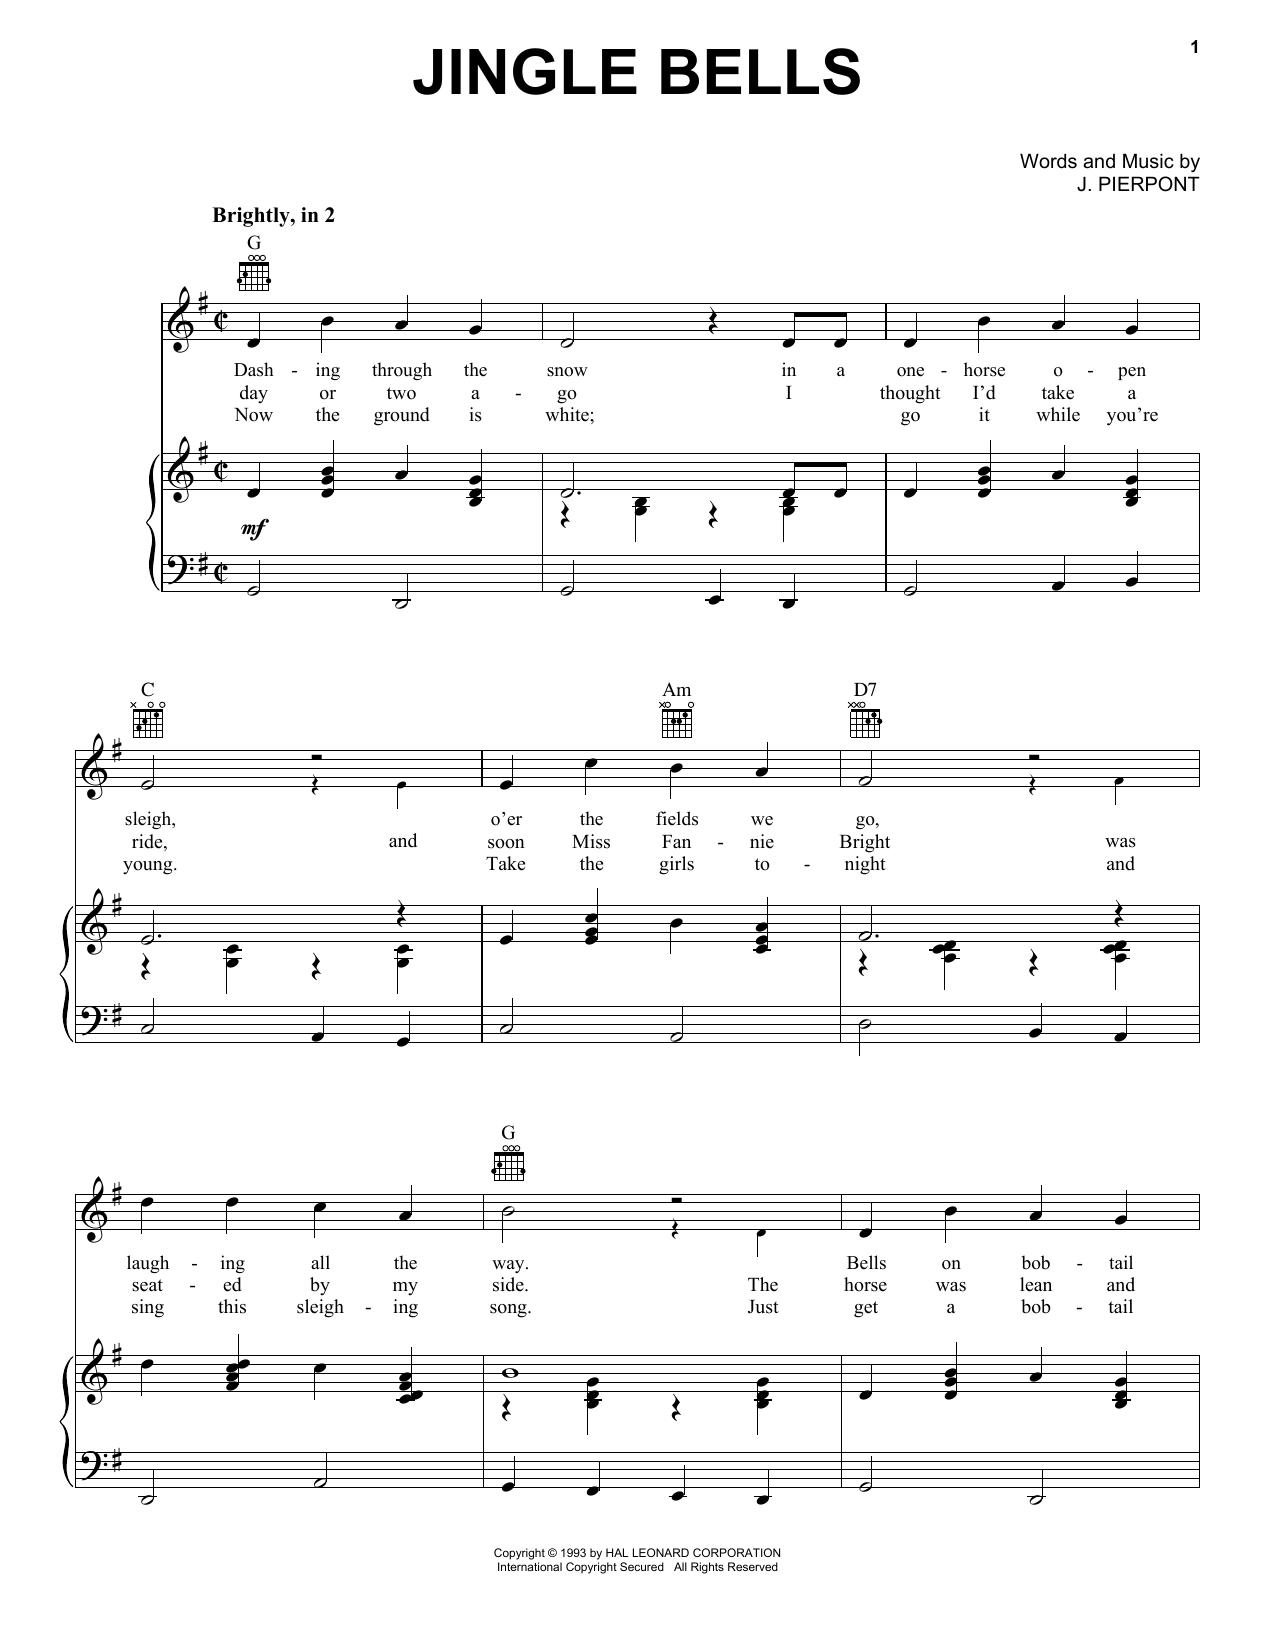 J  Pierpont 'Jingle Bells' Sheet Music Notes, Chords | Download Printable  Trumpet Duet - SKU: 255019